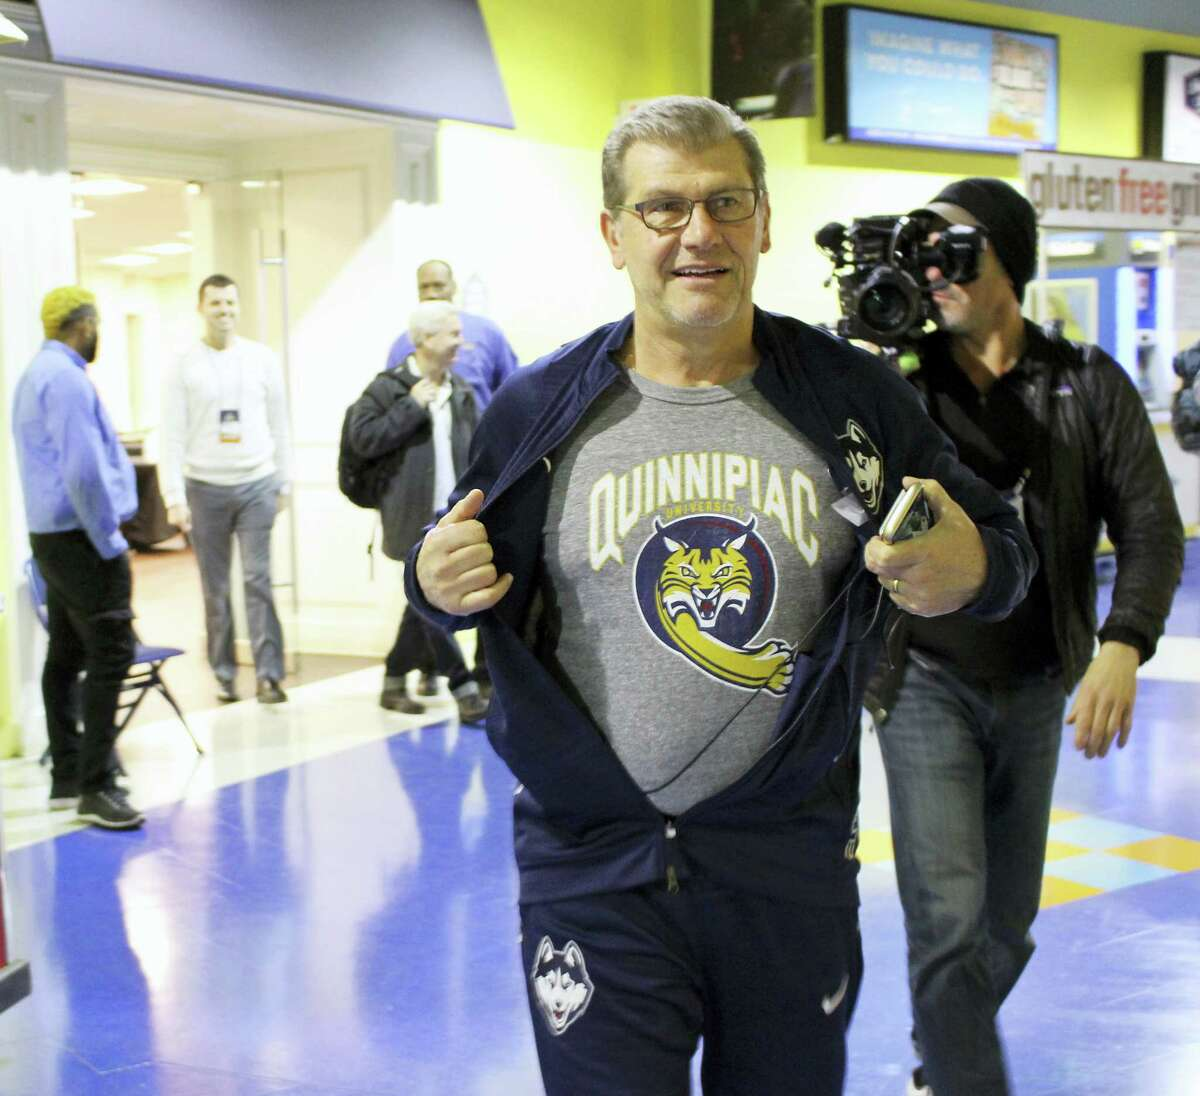 UConn coach Geno Auriemma displays a Quinnipiac University T-shirt in Bridgeport on Friday.